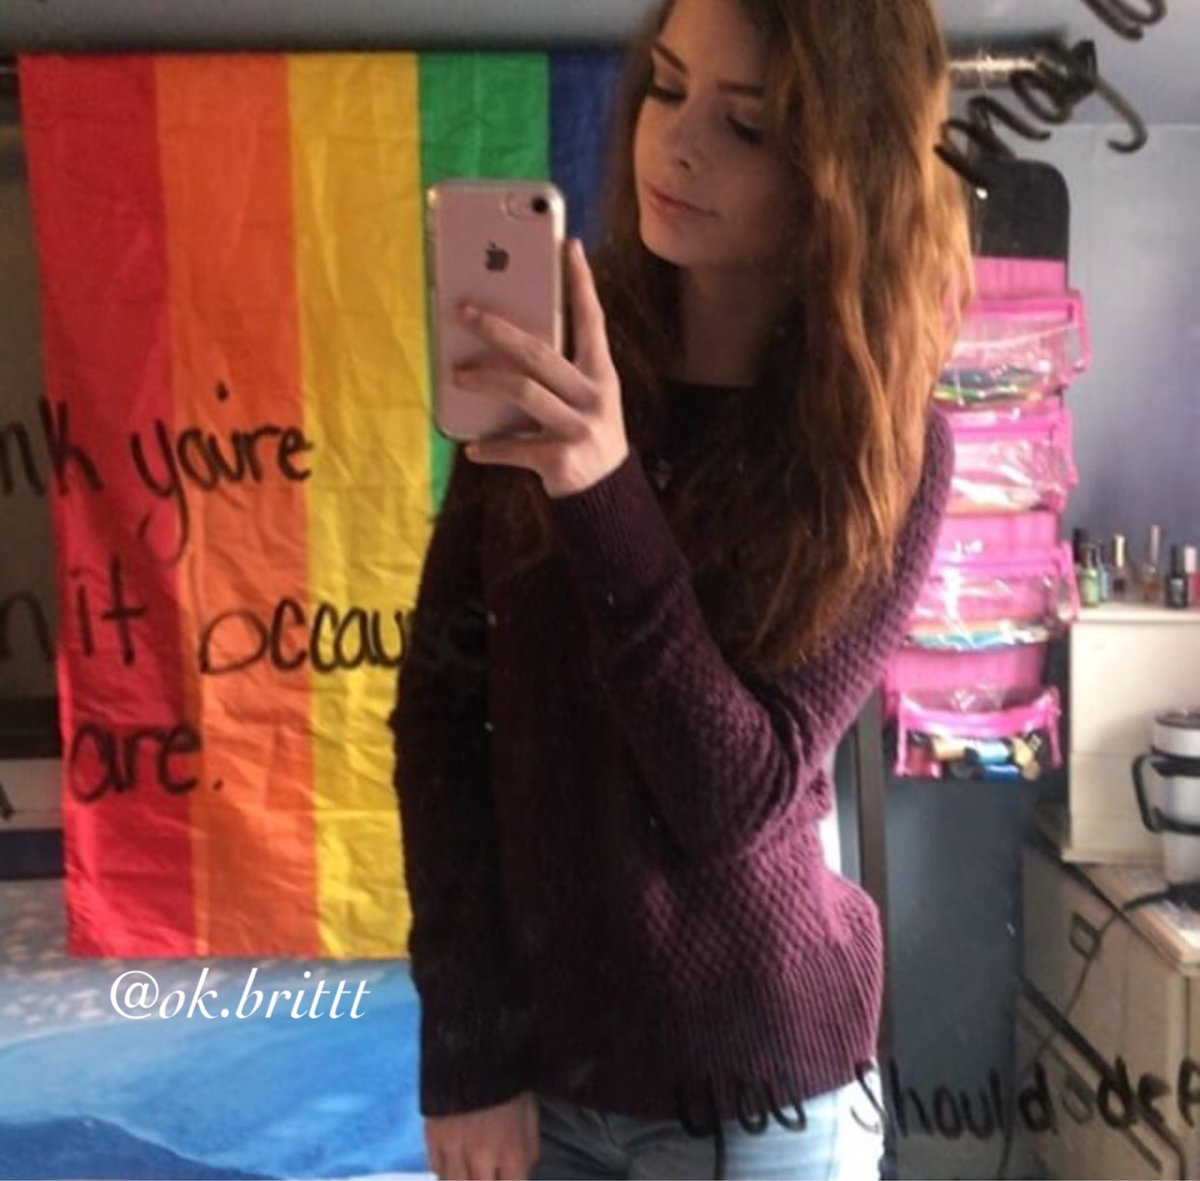 Teen selfies twitter